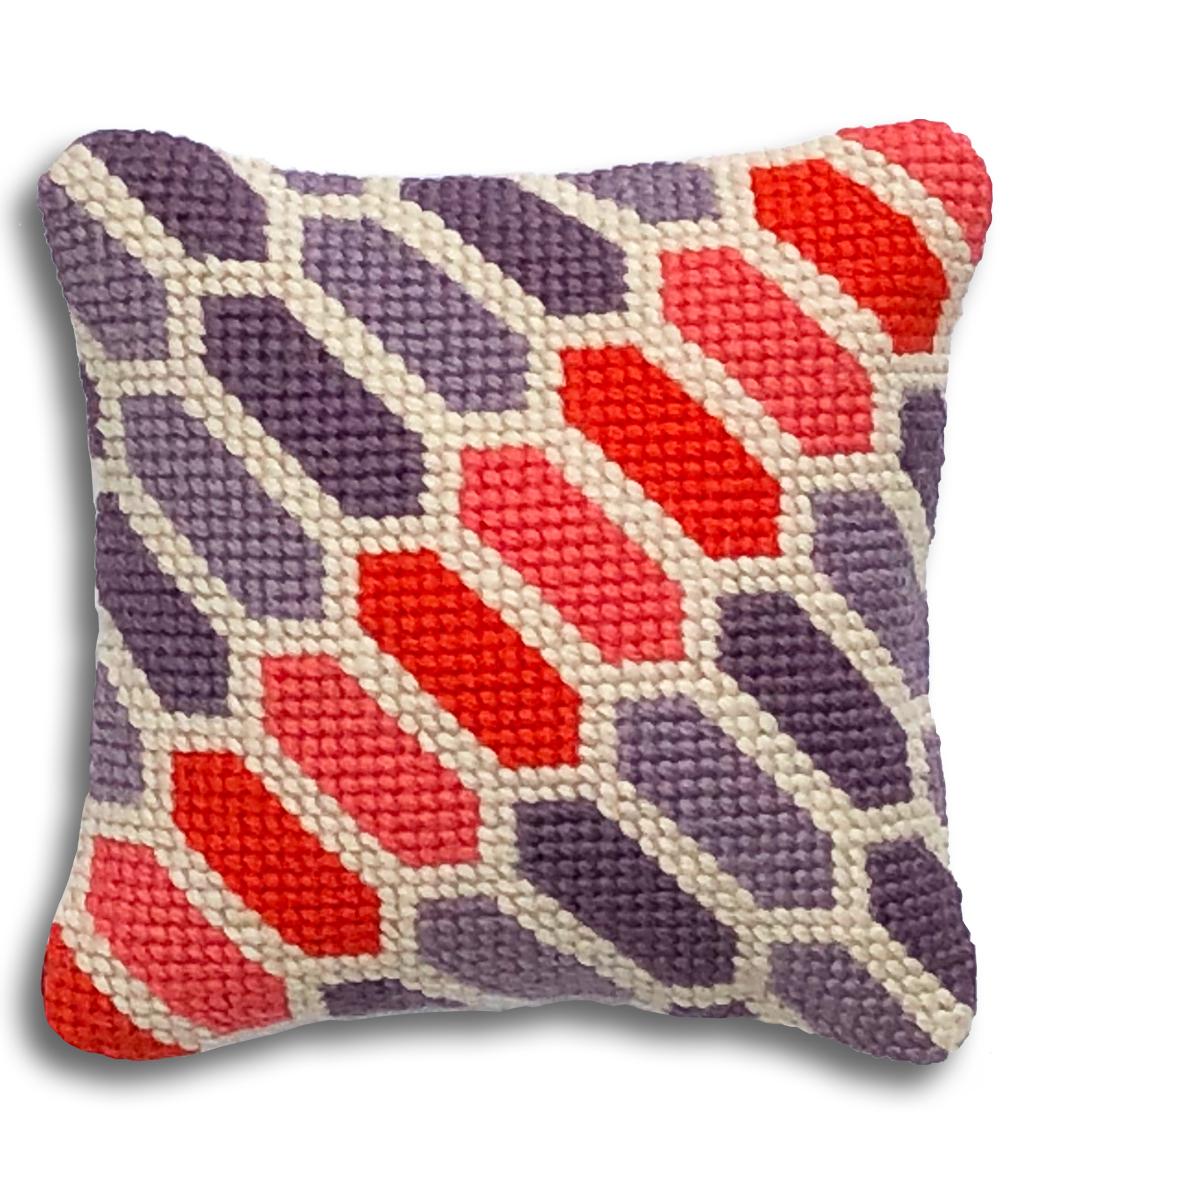 Geometric Hexagons mini kit    Mauve, orange and coral colourway  £16  (includes free UK postage)